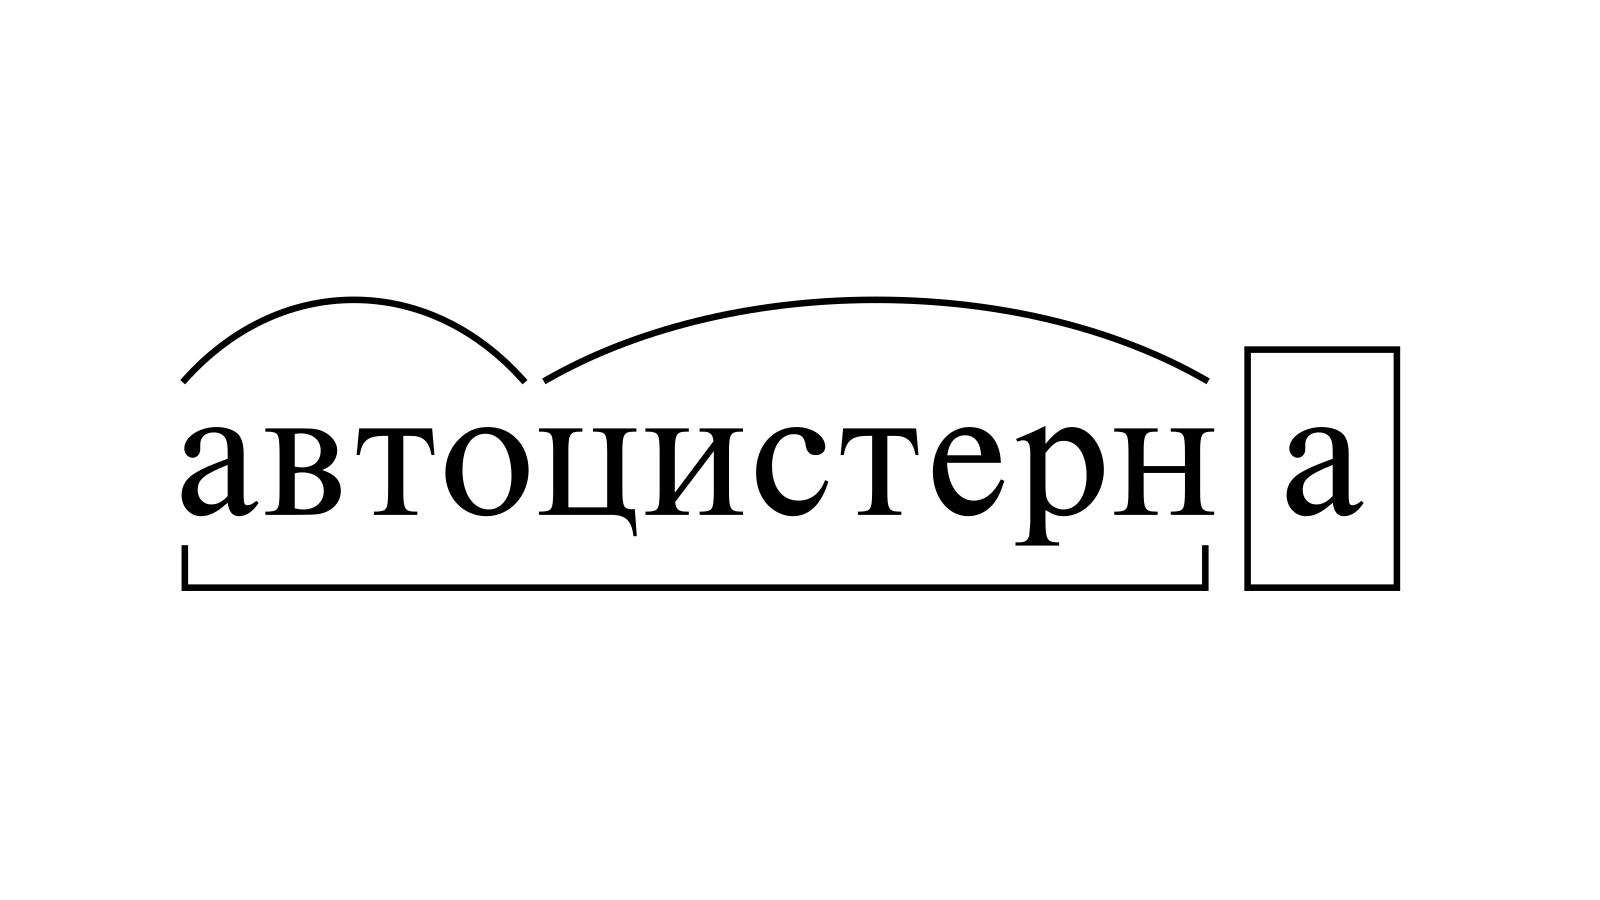 Разбор слова «автоцистерна» по составу